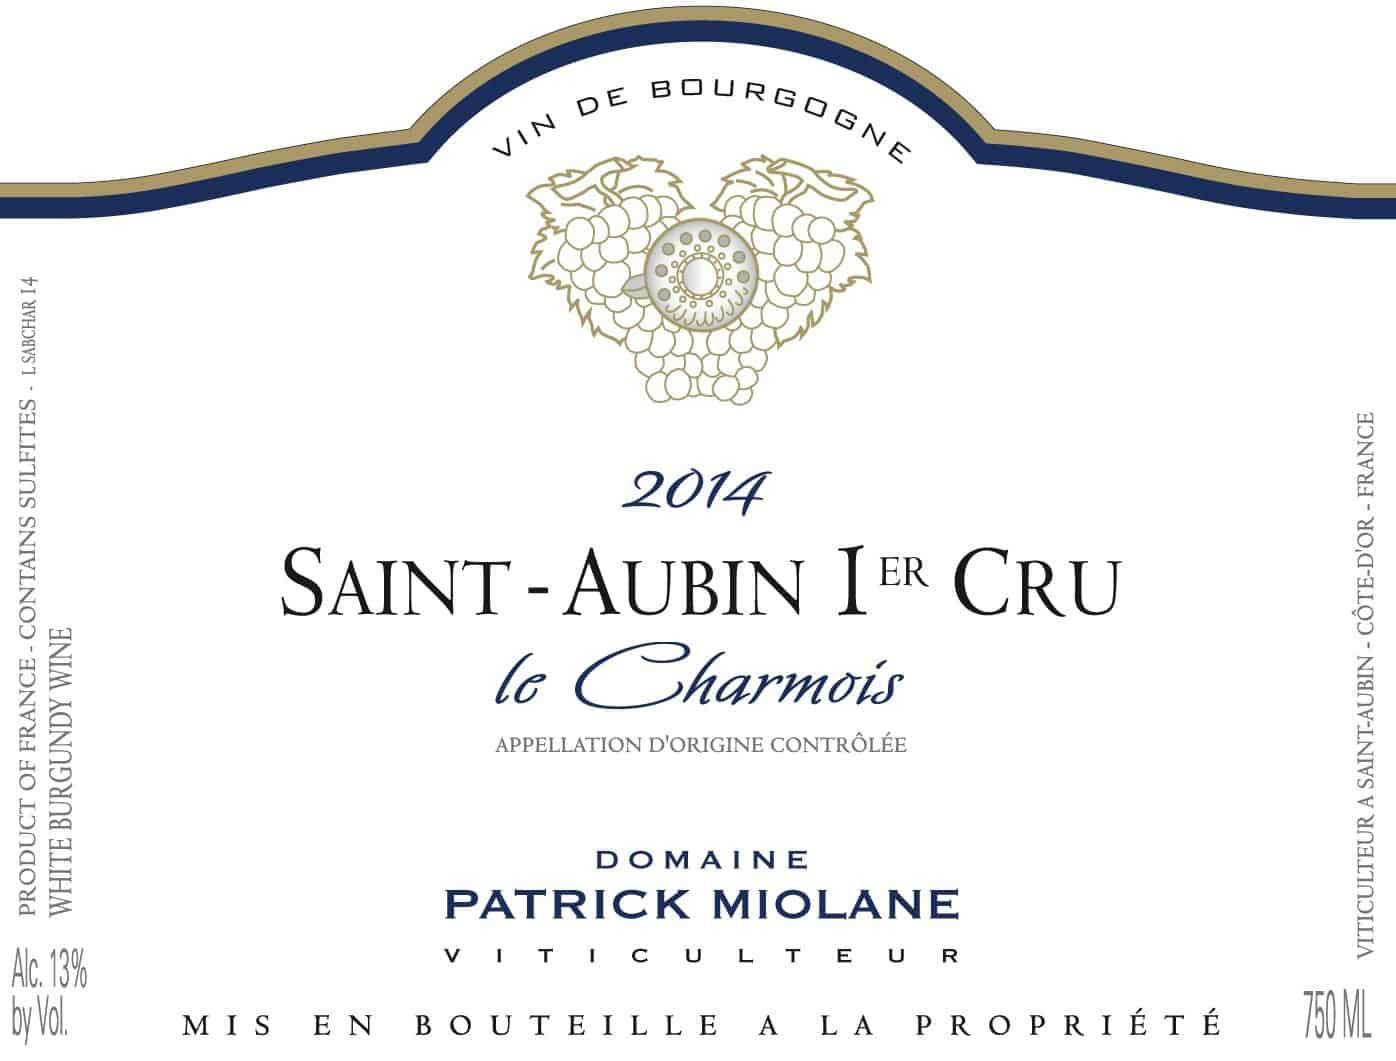 St Aubin Charmois blc 2014